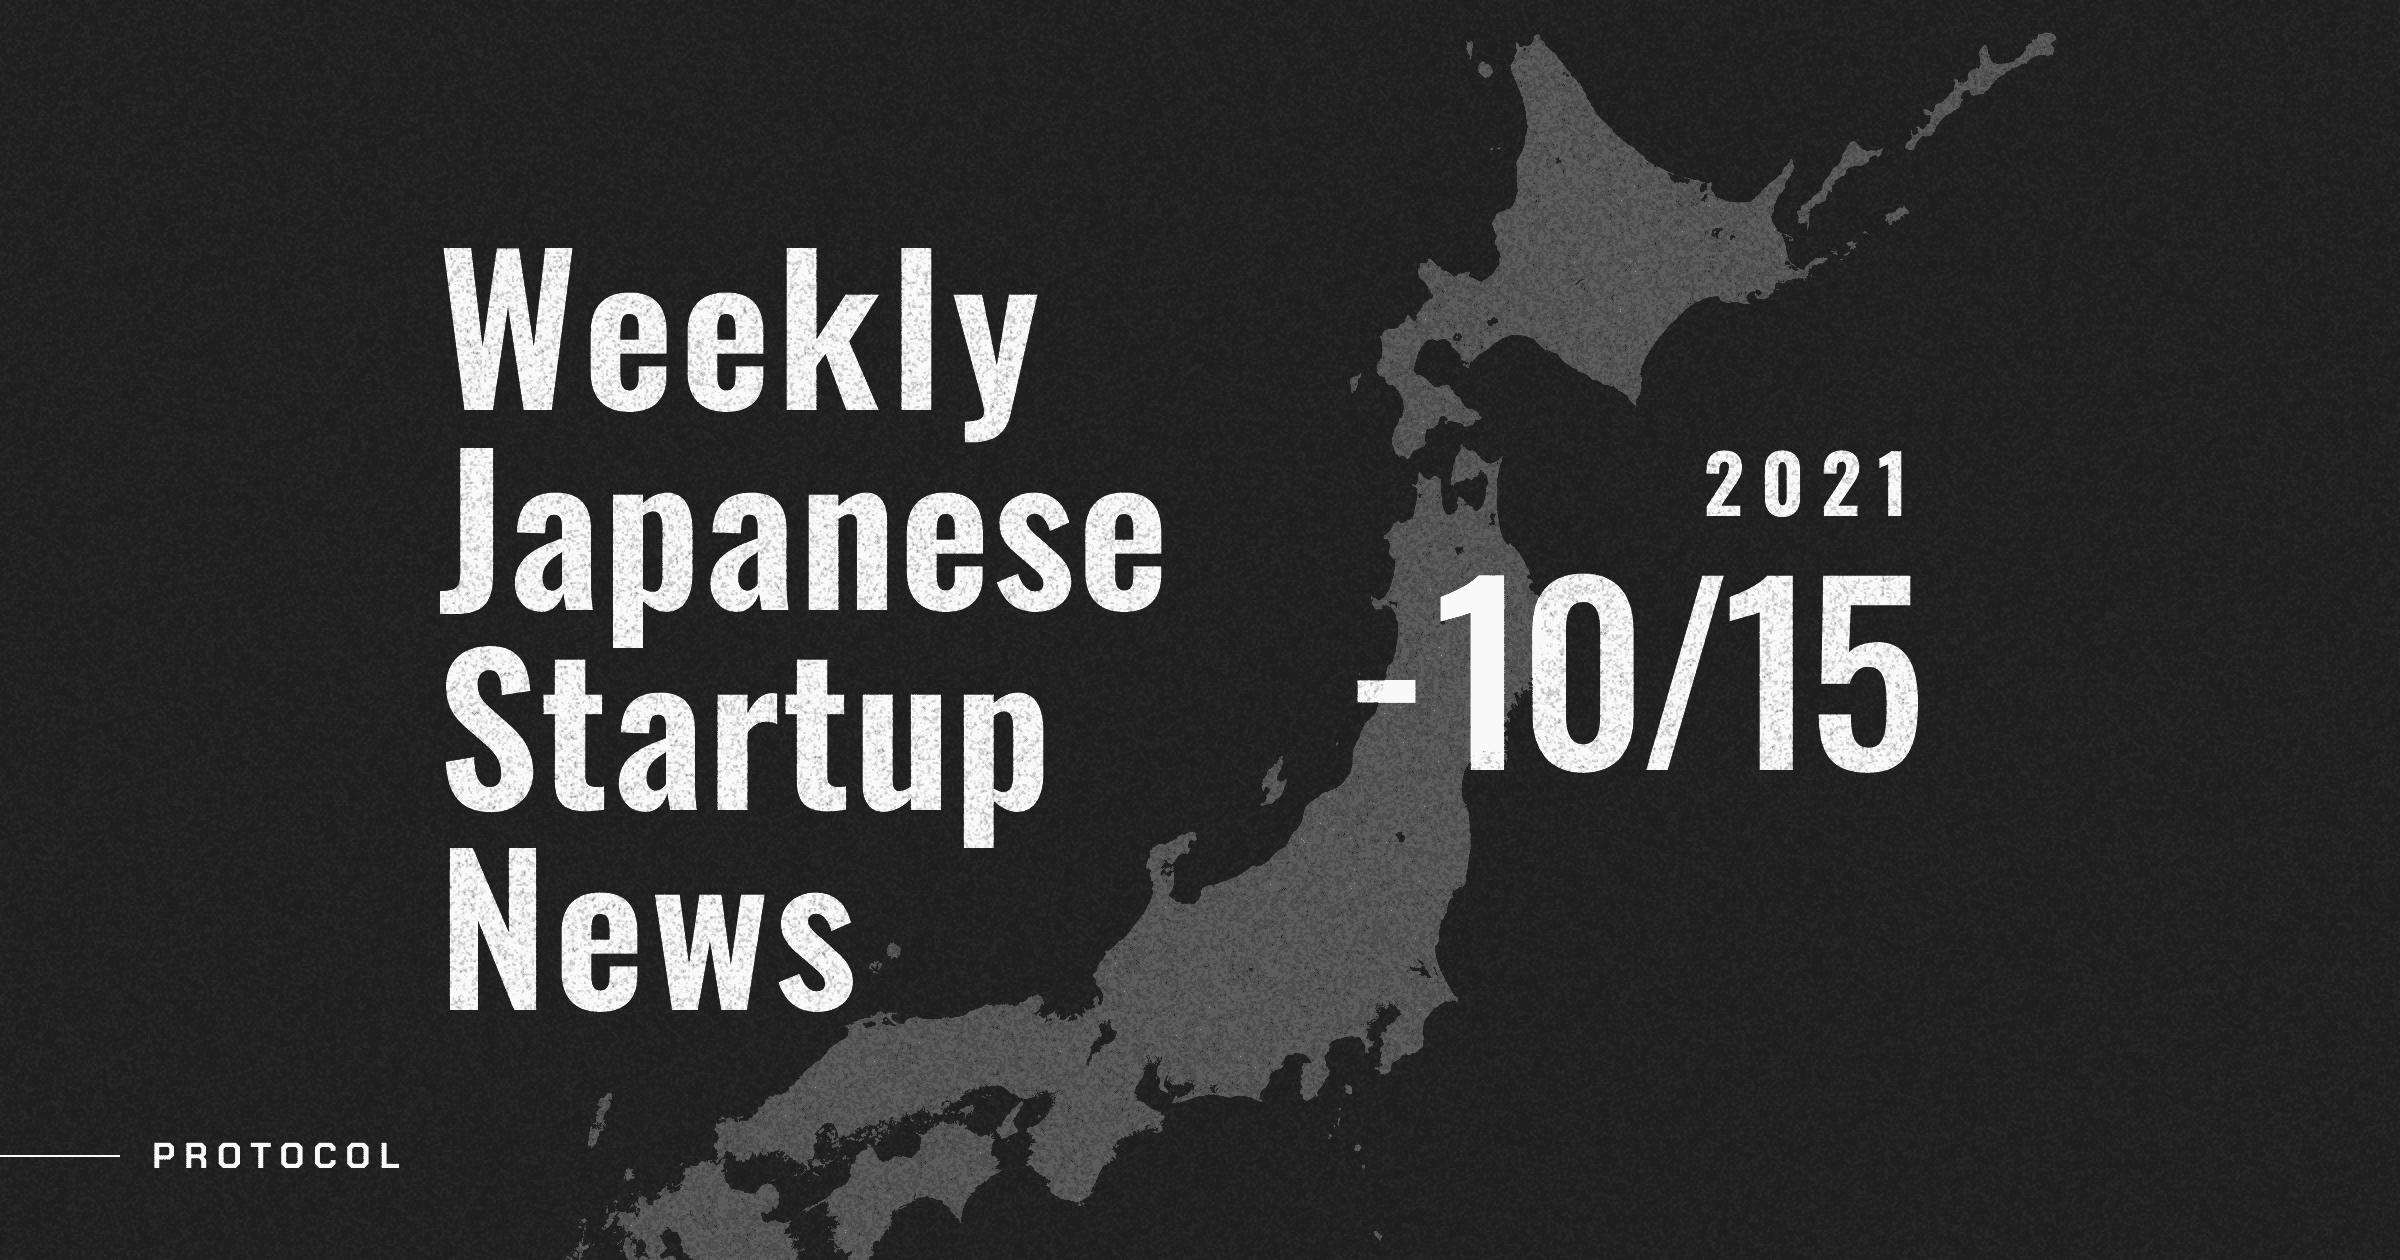 Weekly Japanese Startup News - 10/15/2021